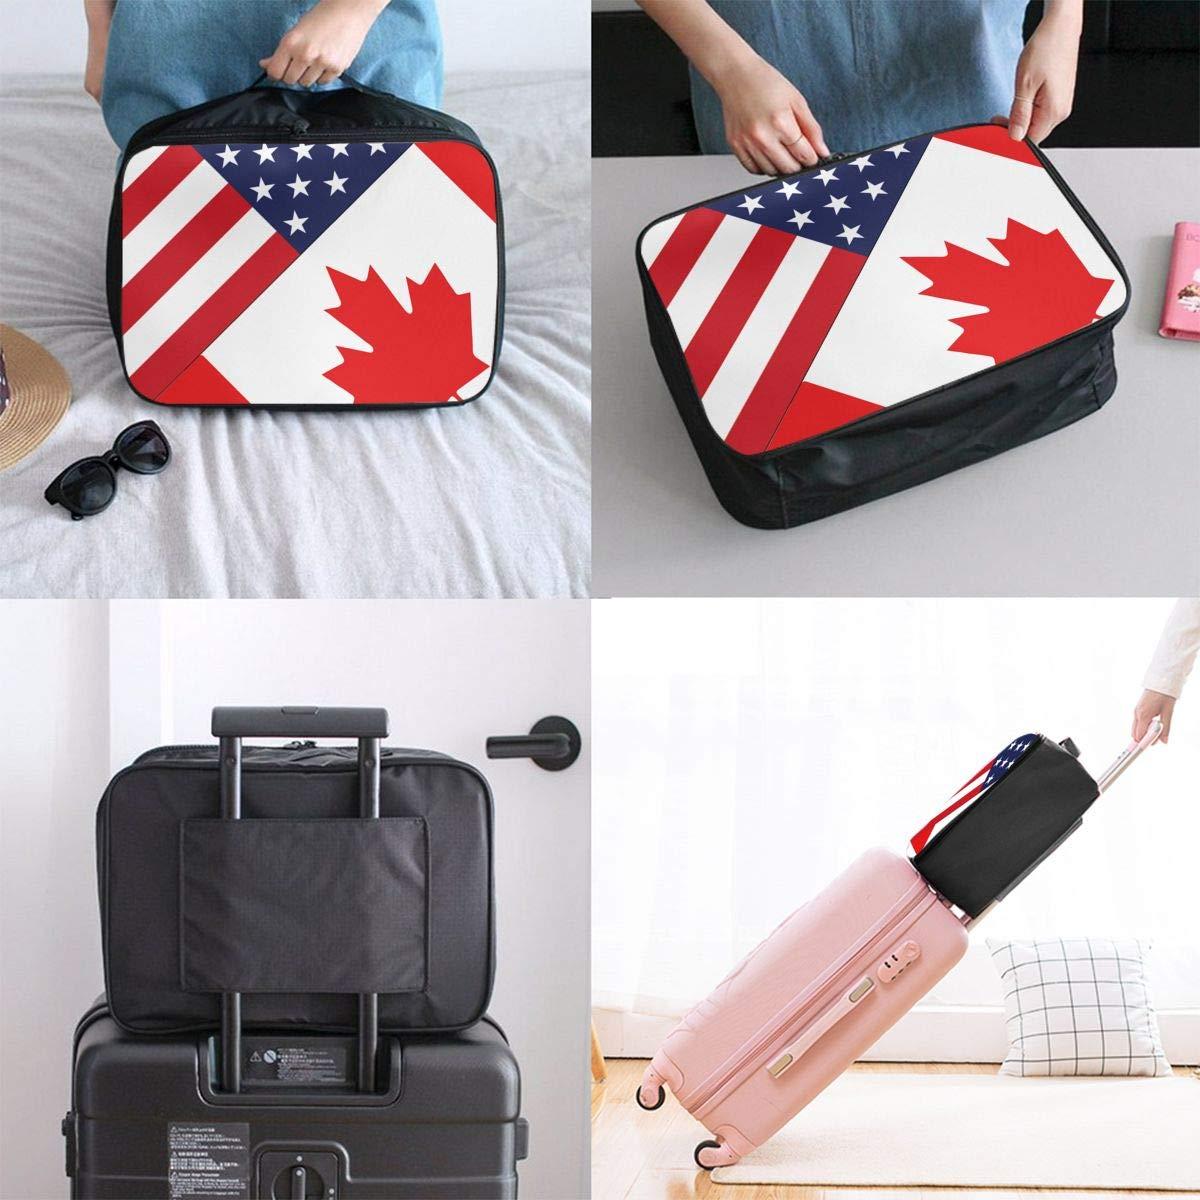 YueLJB USA Canada Flag Combine Lightweight Large Capacity Portable Luggage Bag Travel Duffel Bag Storage Carry Luggage Duffle Tote Bag